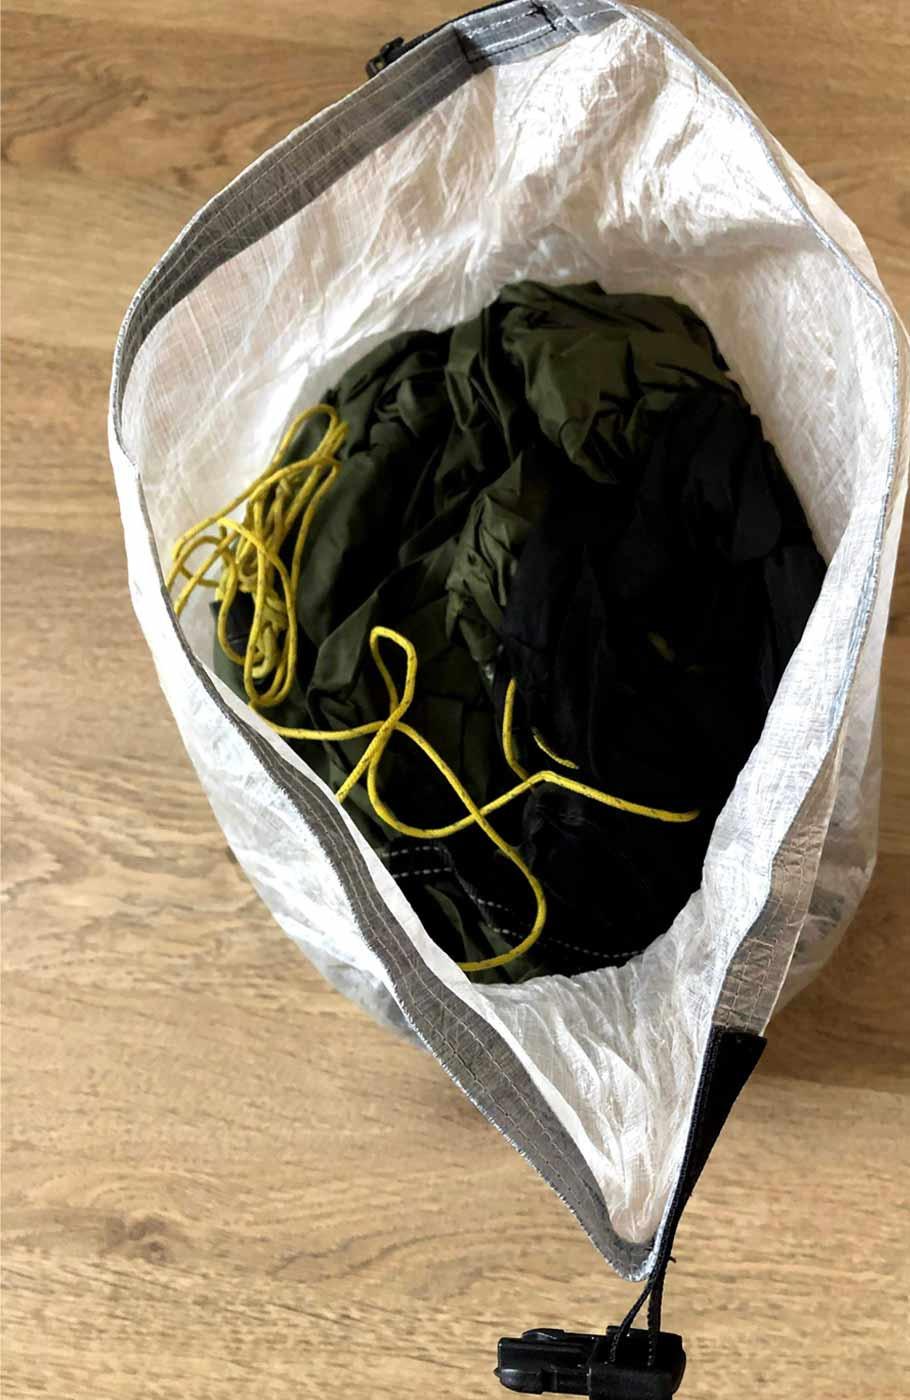 Ultraleichter Dyneema Rolltop Drybag geöffnet mit Zelt befüllt.